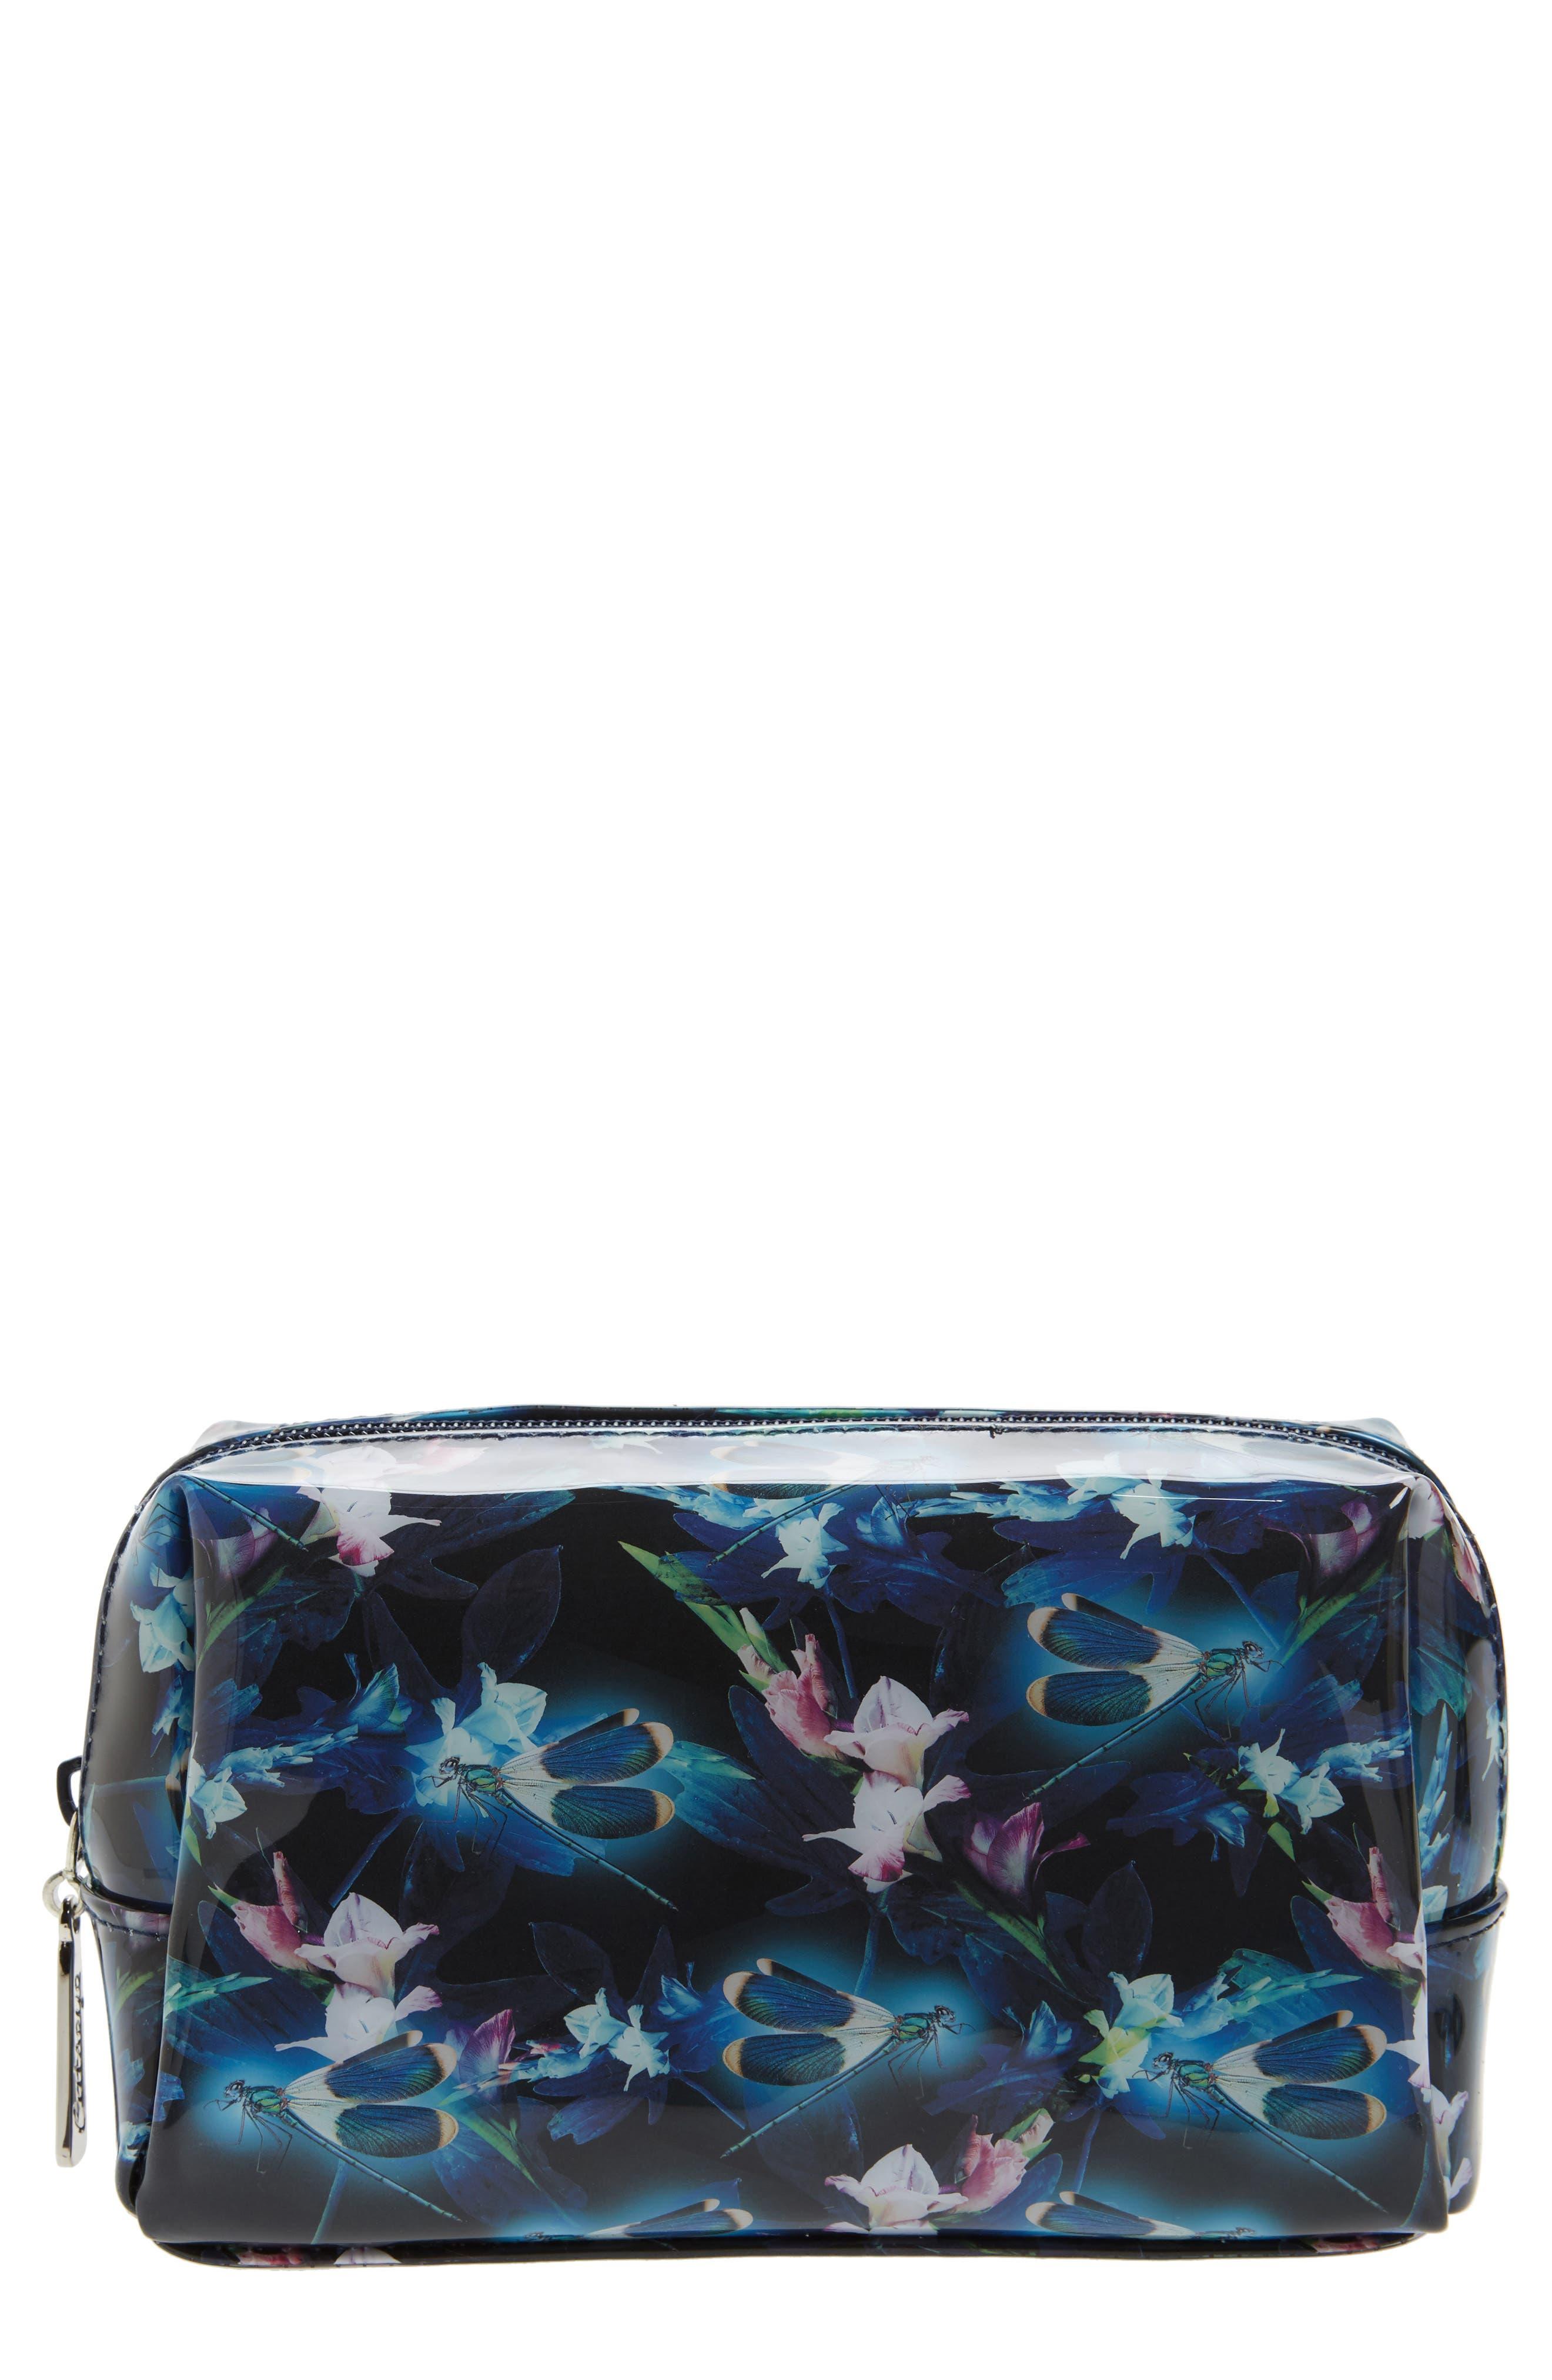 Catseye London Night Blooms Cosmetics Bag